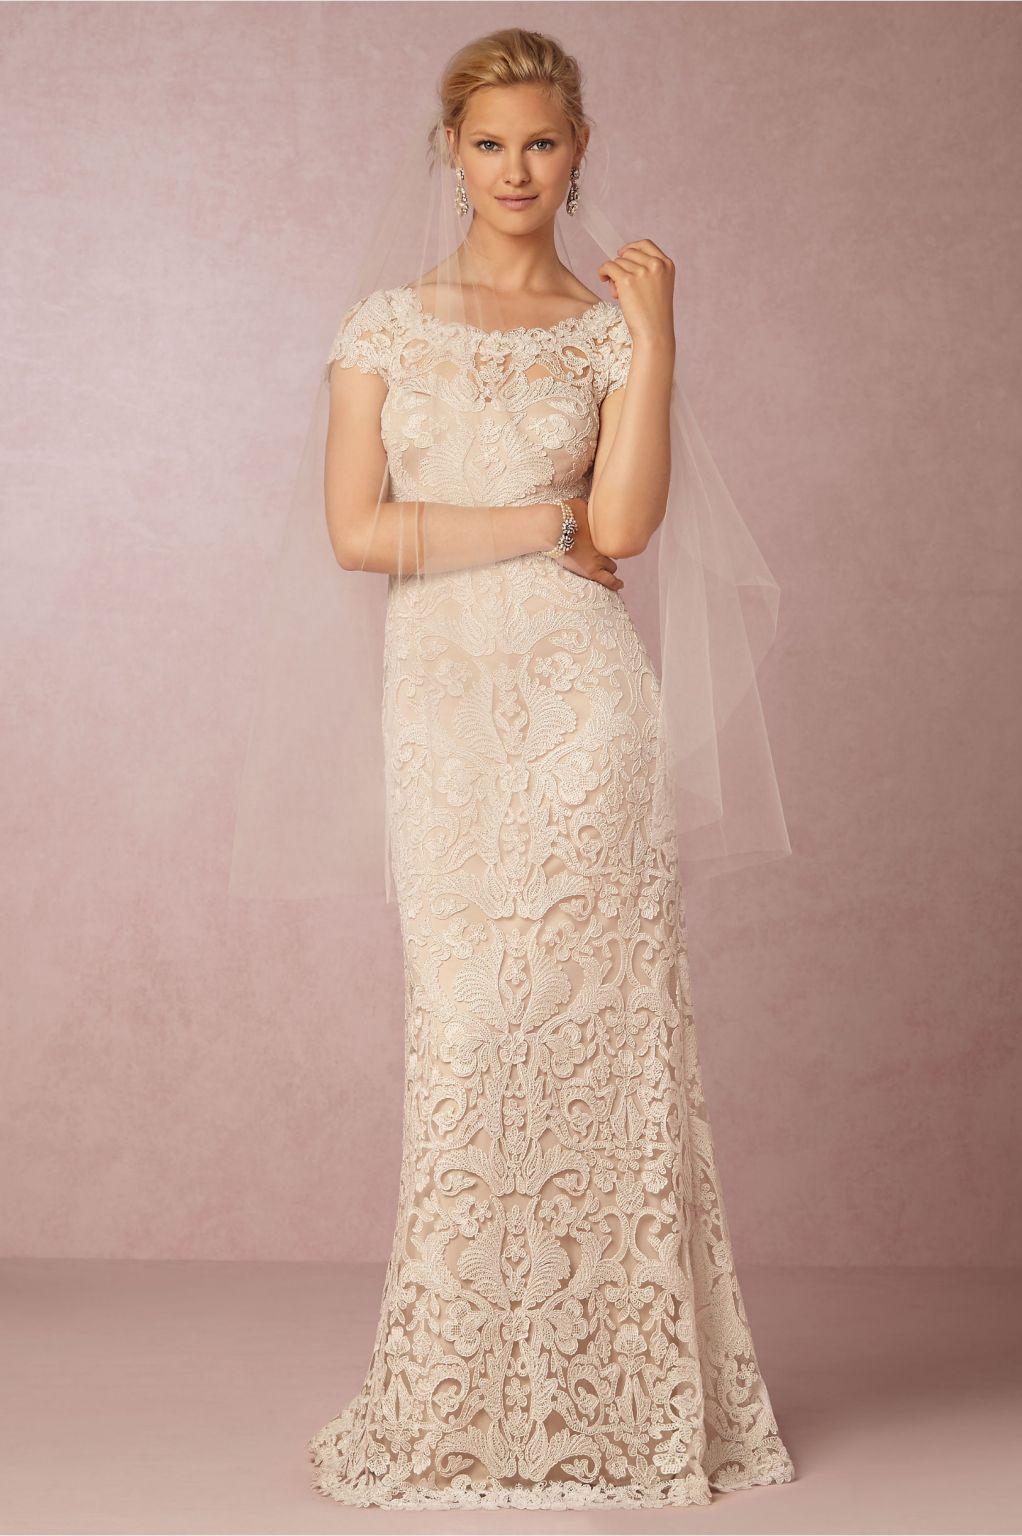 Bhldn Used Wedding Dresses - datphongnhanhre